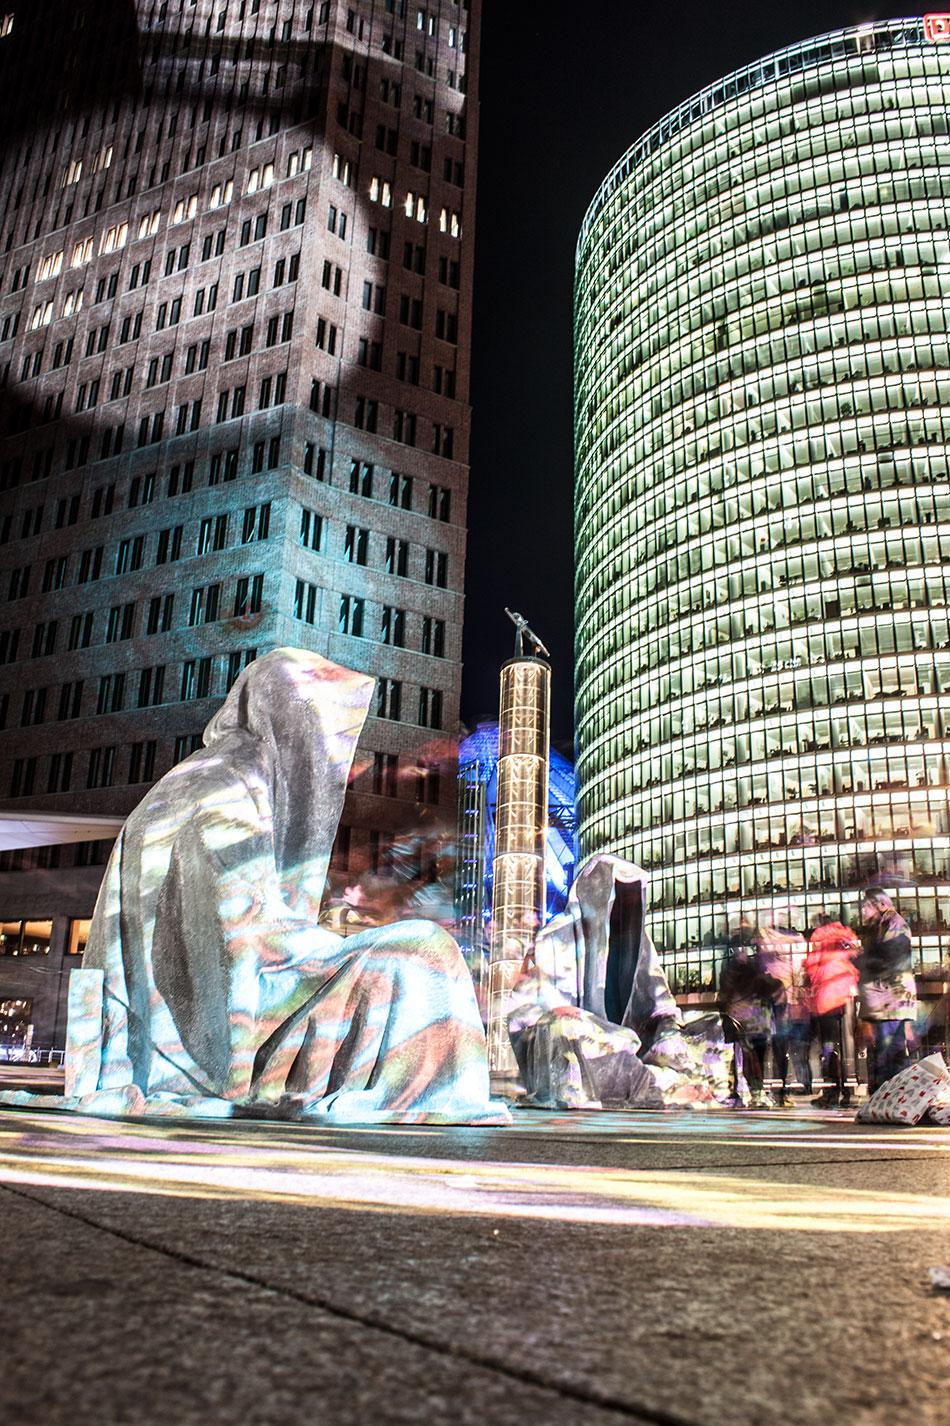 festival-of-lights-berlin-potzdamer-platz-light-art-show-exhibition-lumina-guardians-of-time-manfred-kili-kielnhofer-contemporary-arts-design-sculpture-3203